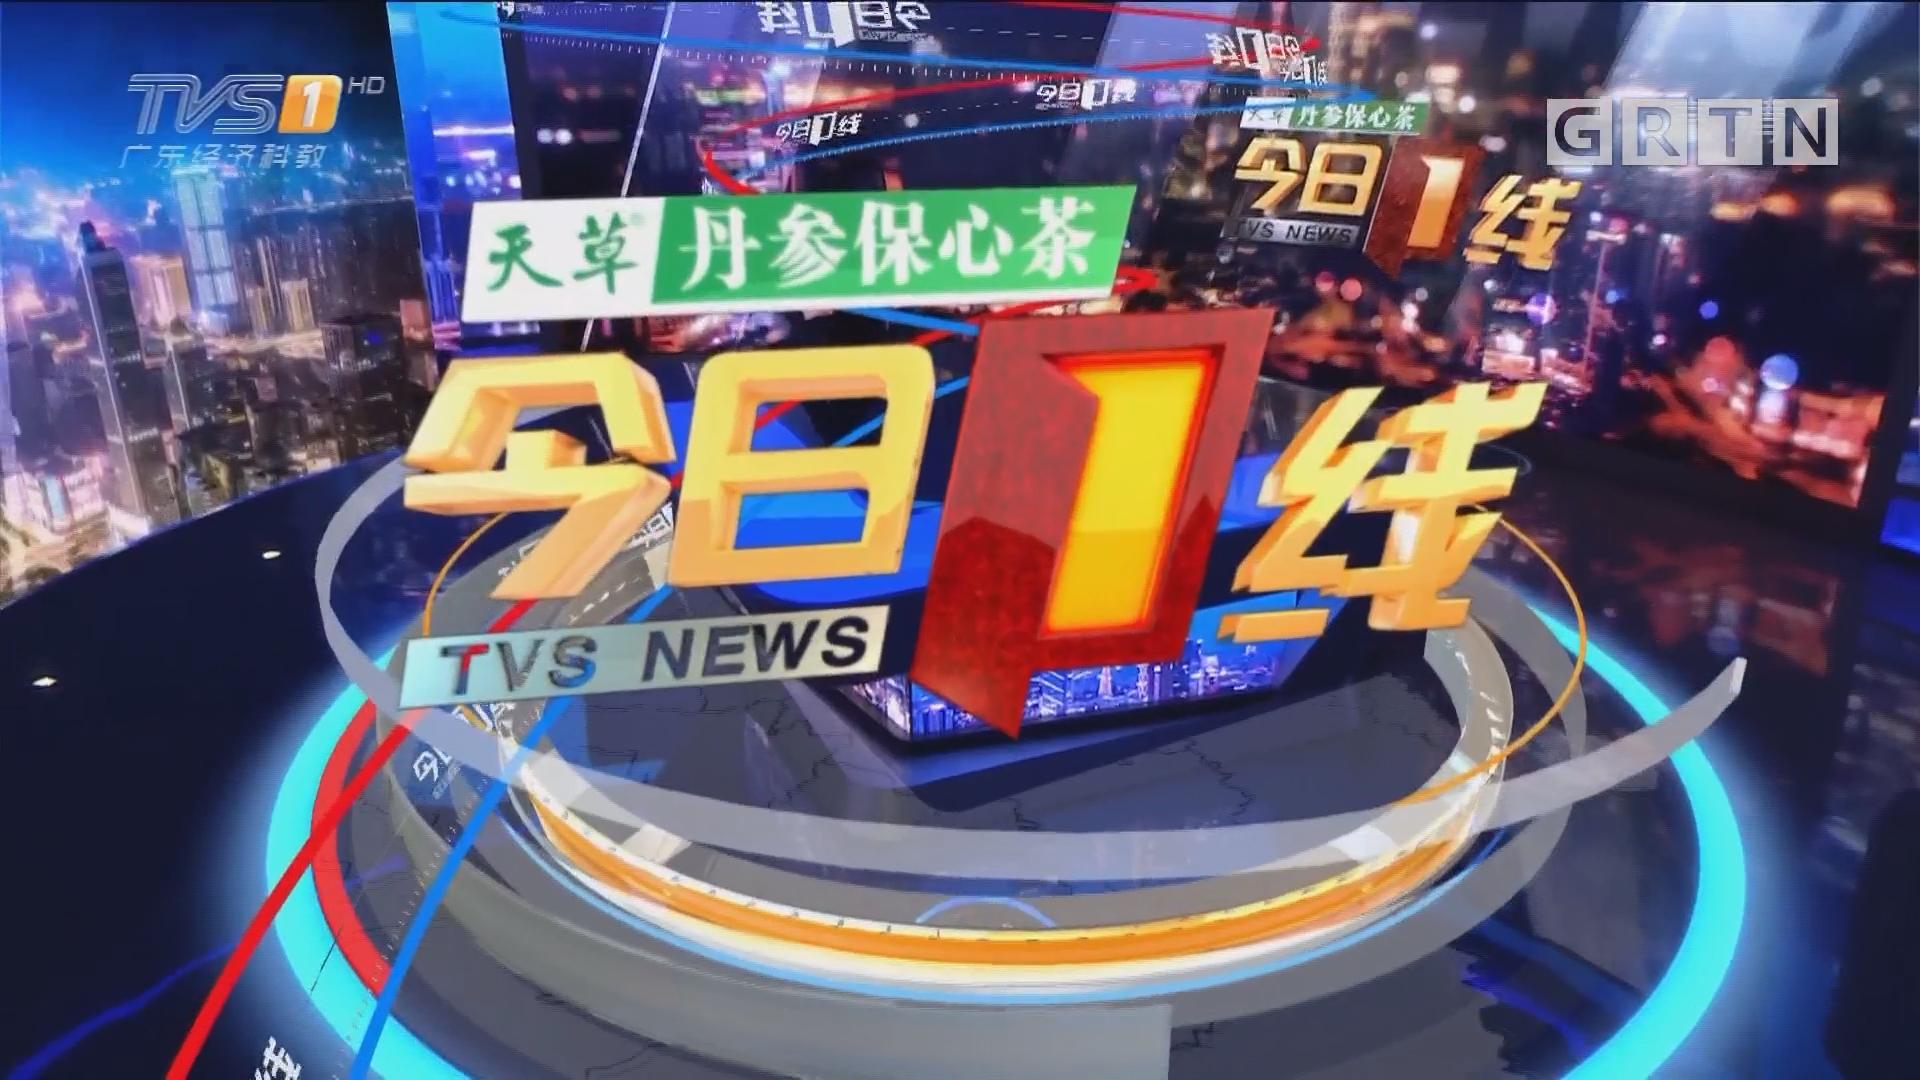 [HD][2018-08-08]今日一线:深圳龙华:突降暴雨河水猛涨 两工人被冲走